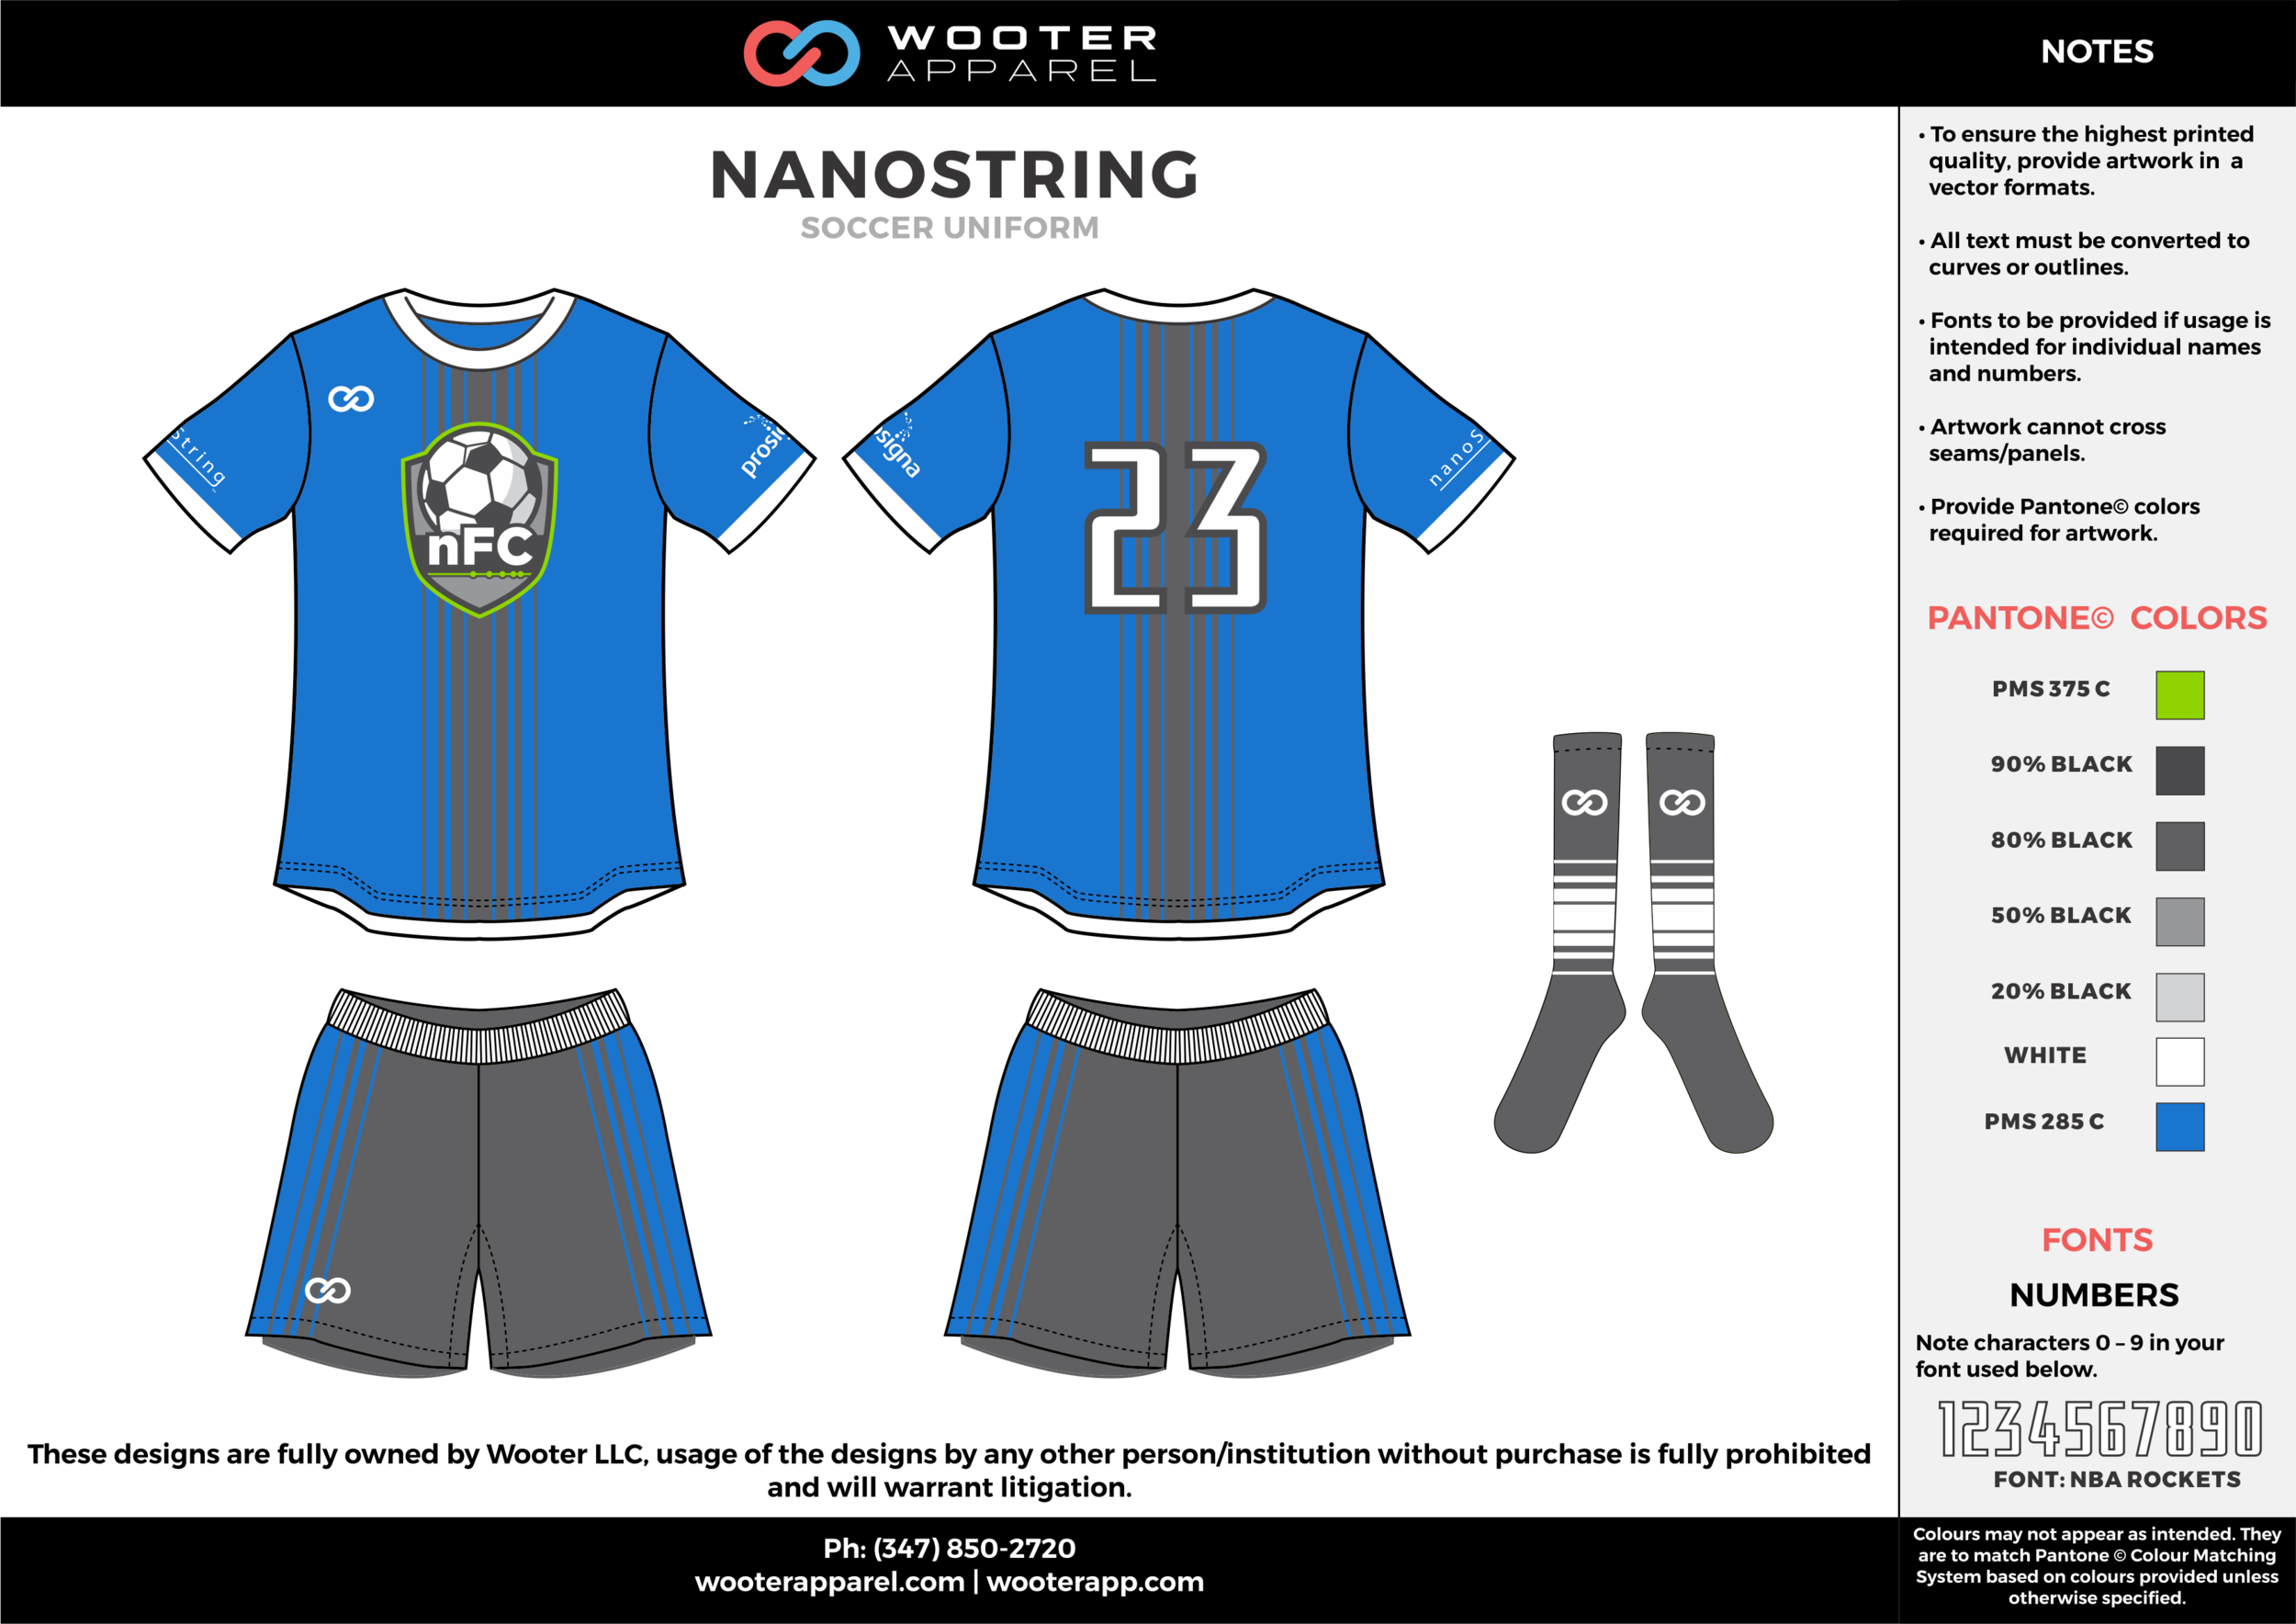 NANOSTRING blue gray white custom sublimated soccer uniform jersey shirt shorts socks